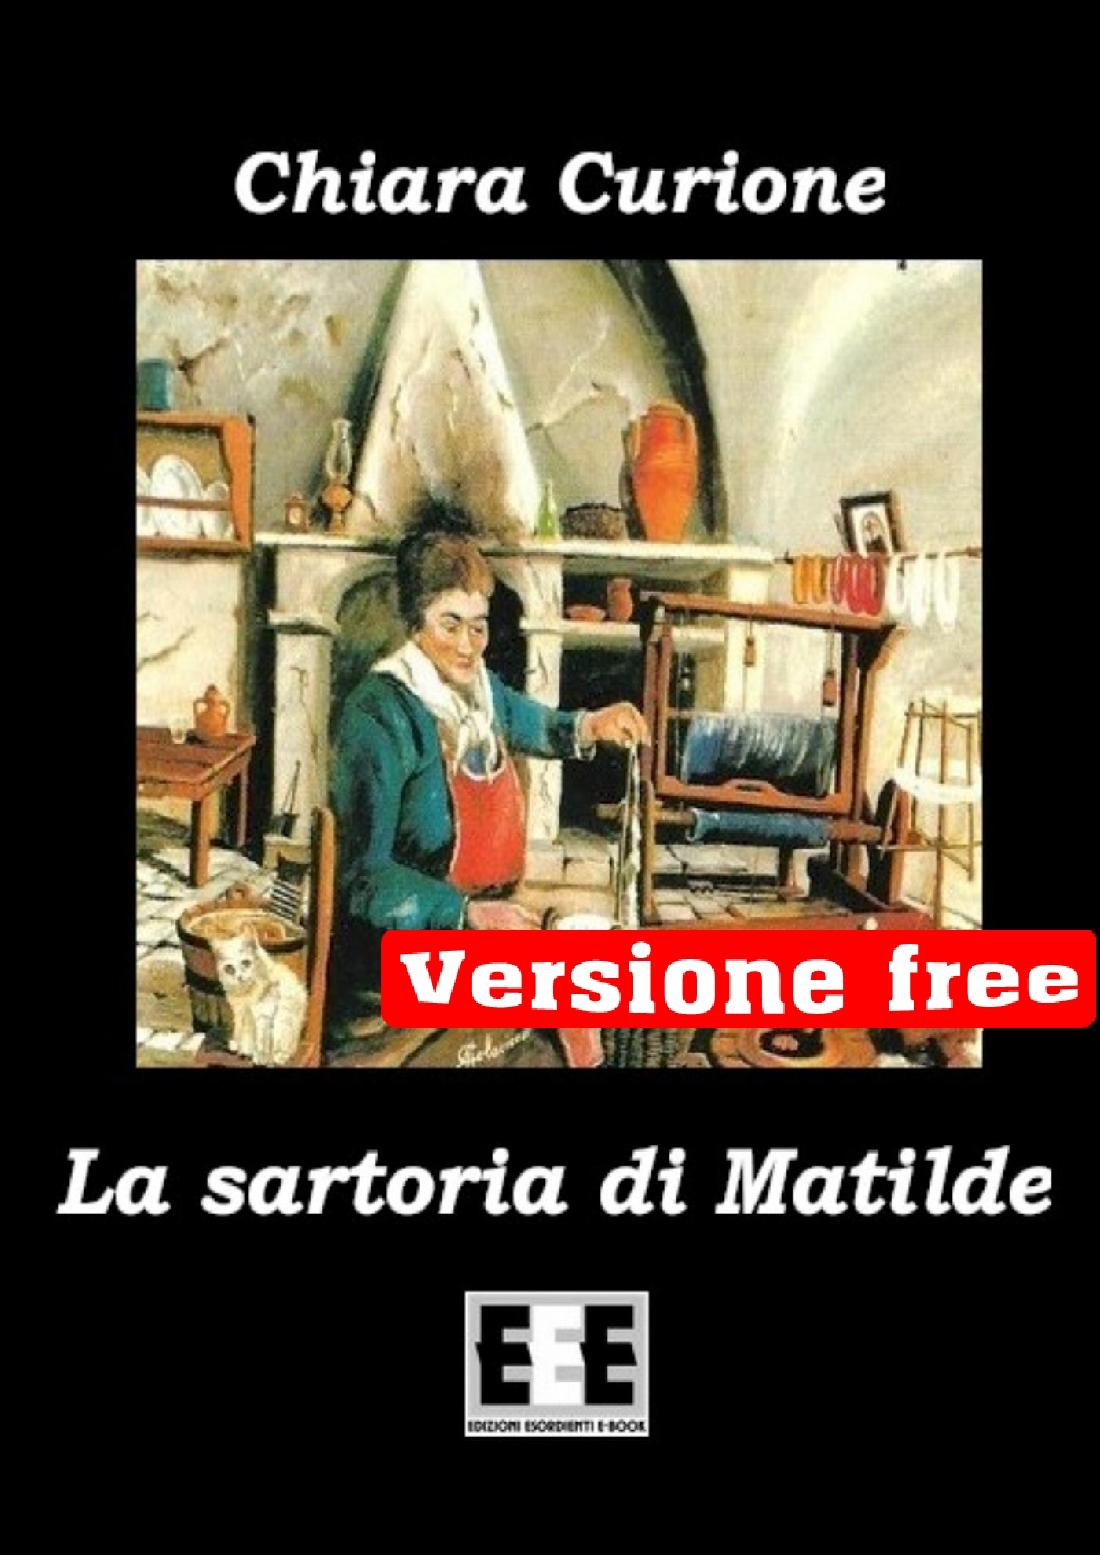 SARTORIA_CURIONE_FREE